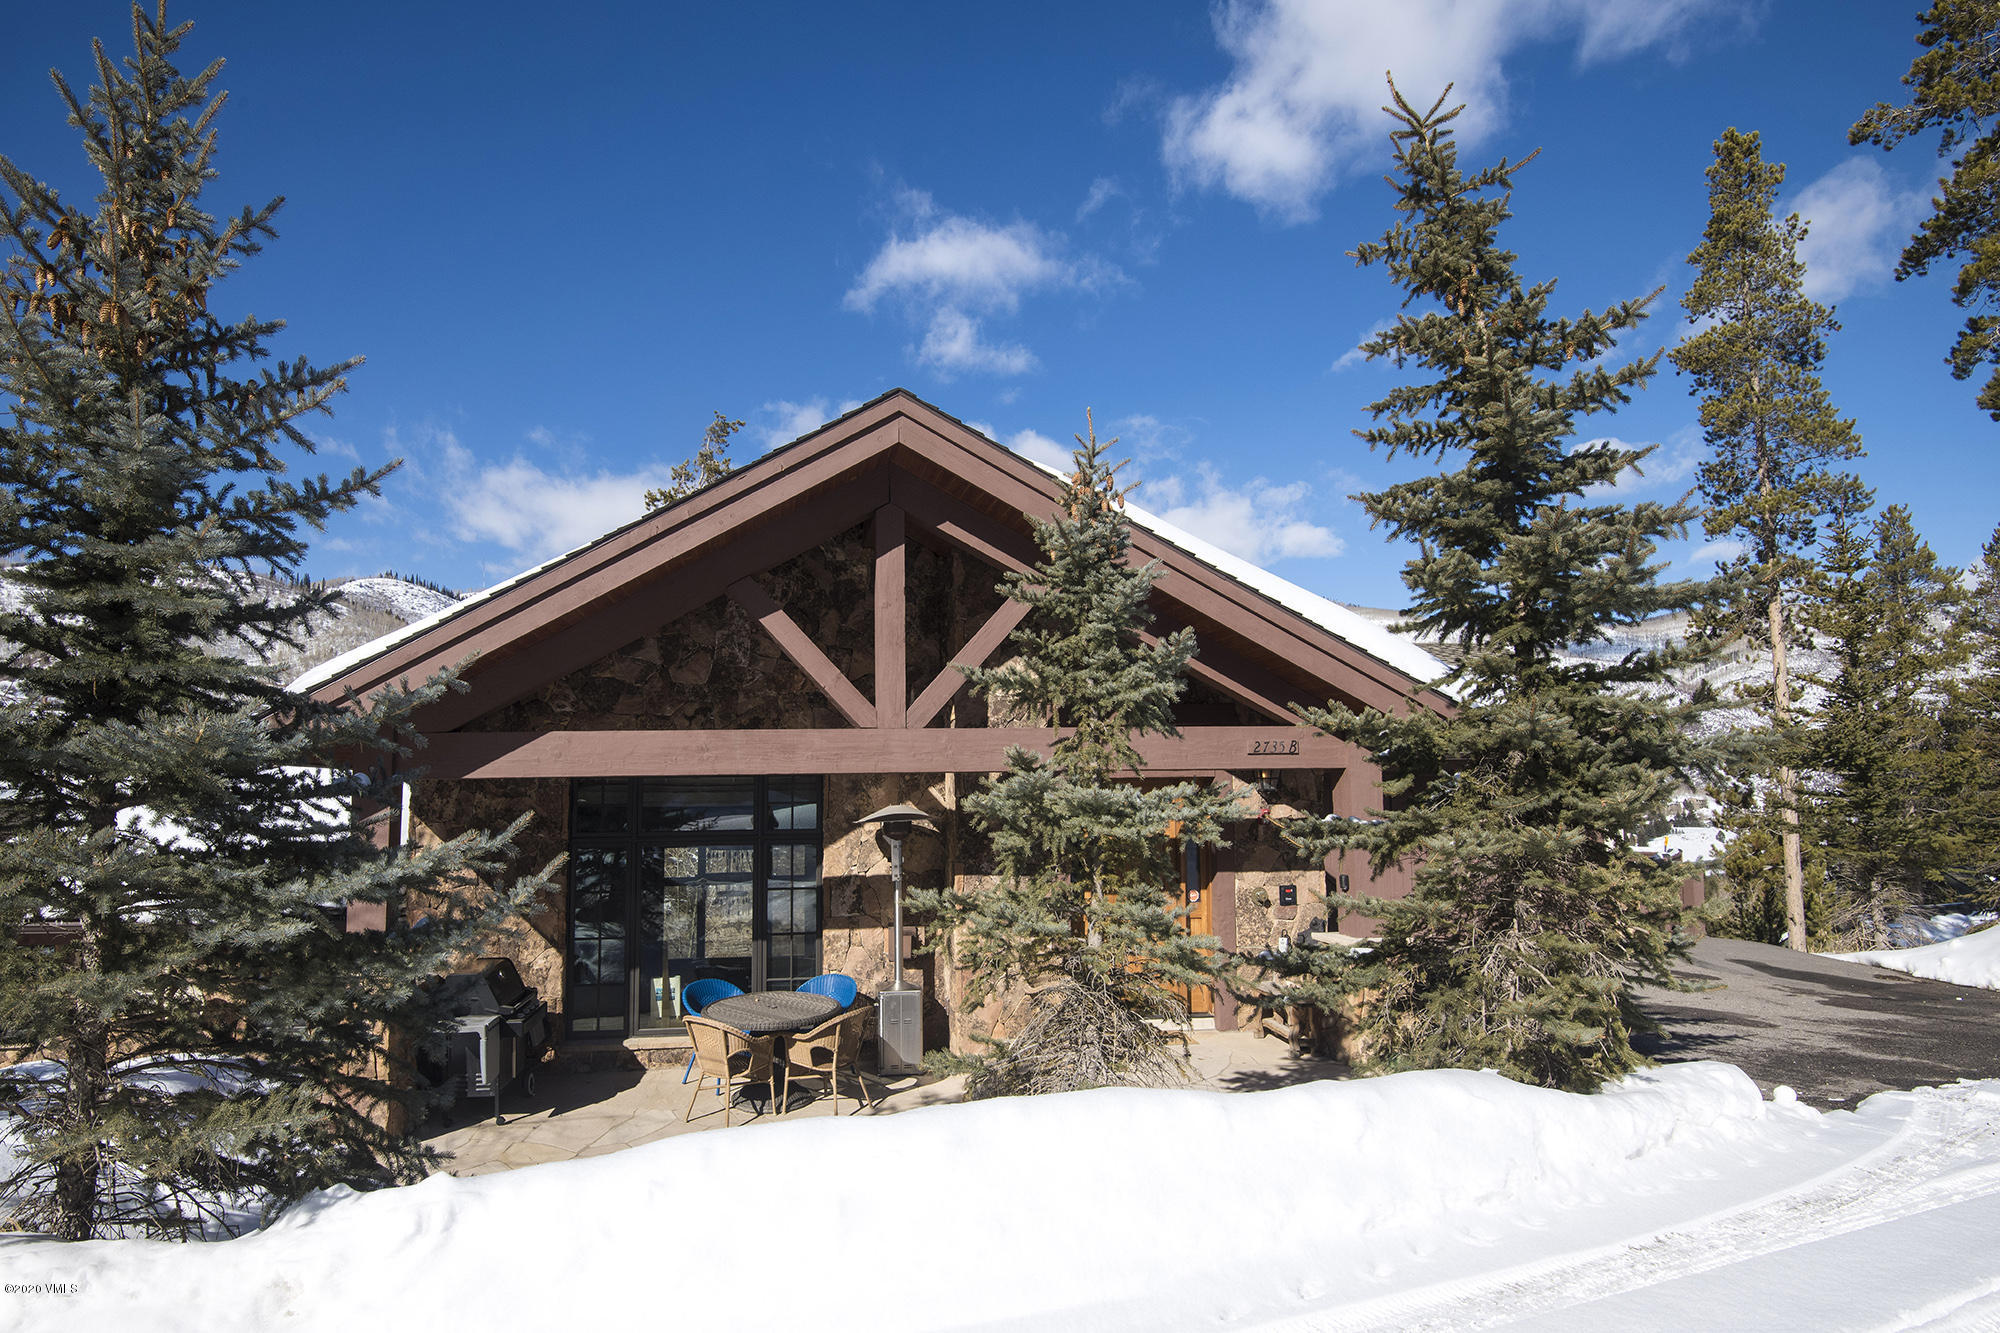 Property image for 2735 Snowberry Drive Unit B